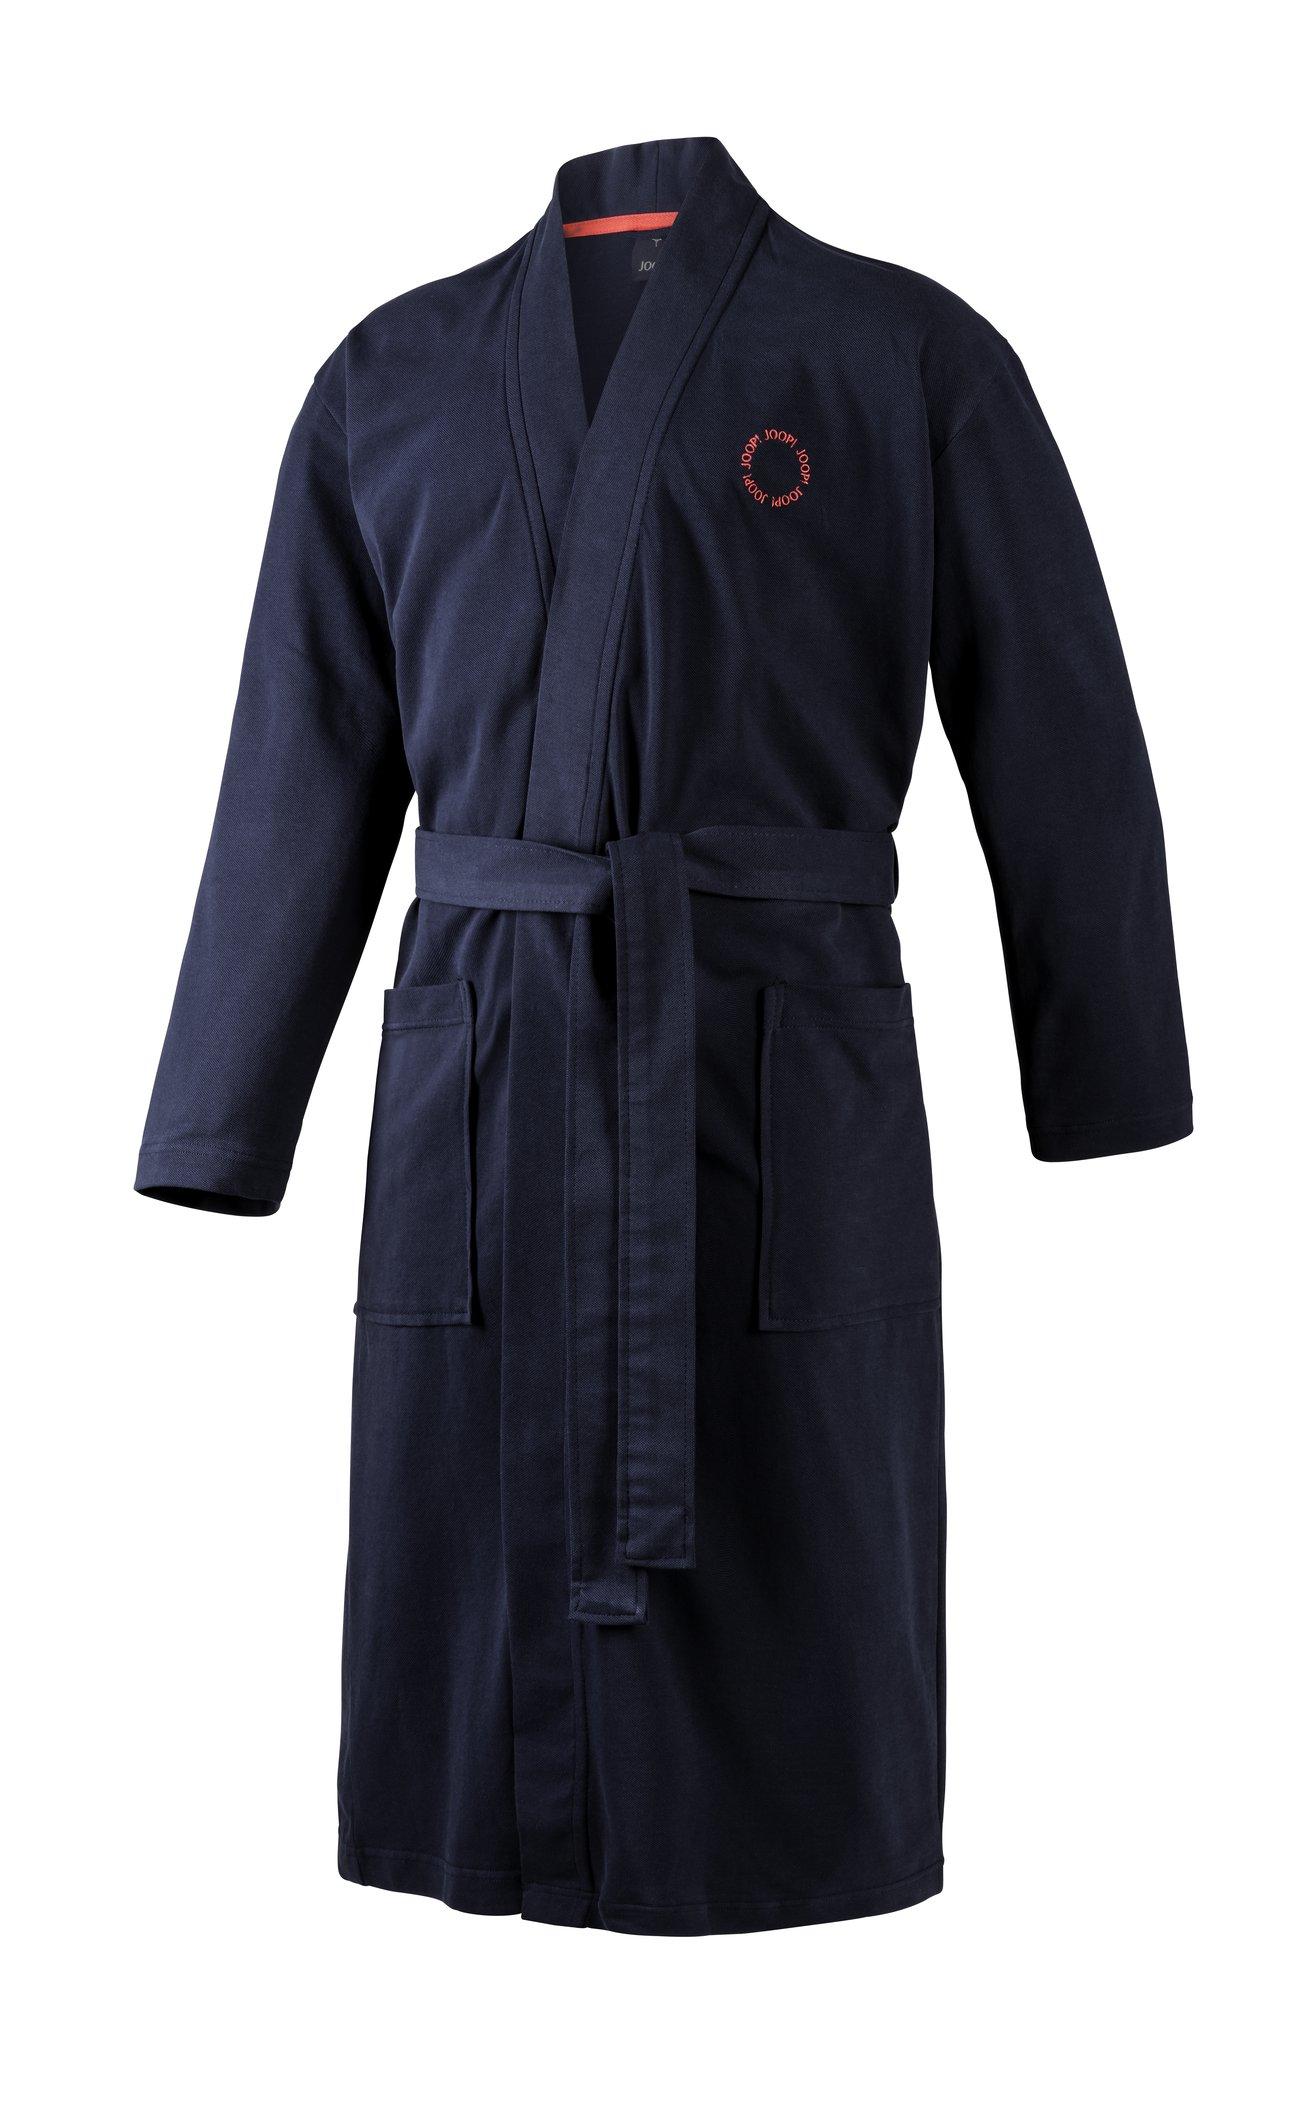 JOOP! Beach Capsule Herren Kimono 1655-12 Marine Größe S 46-48